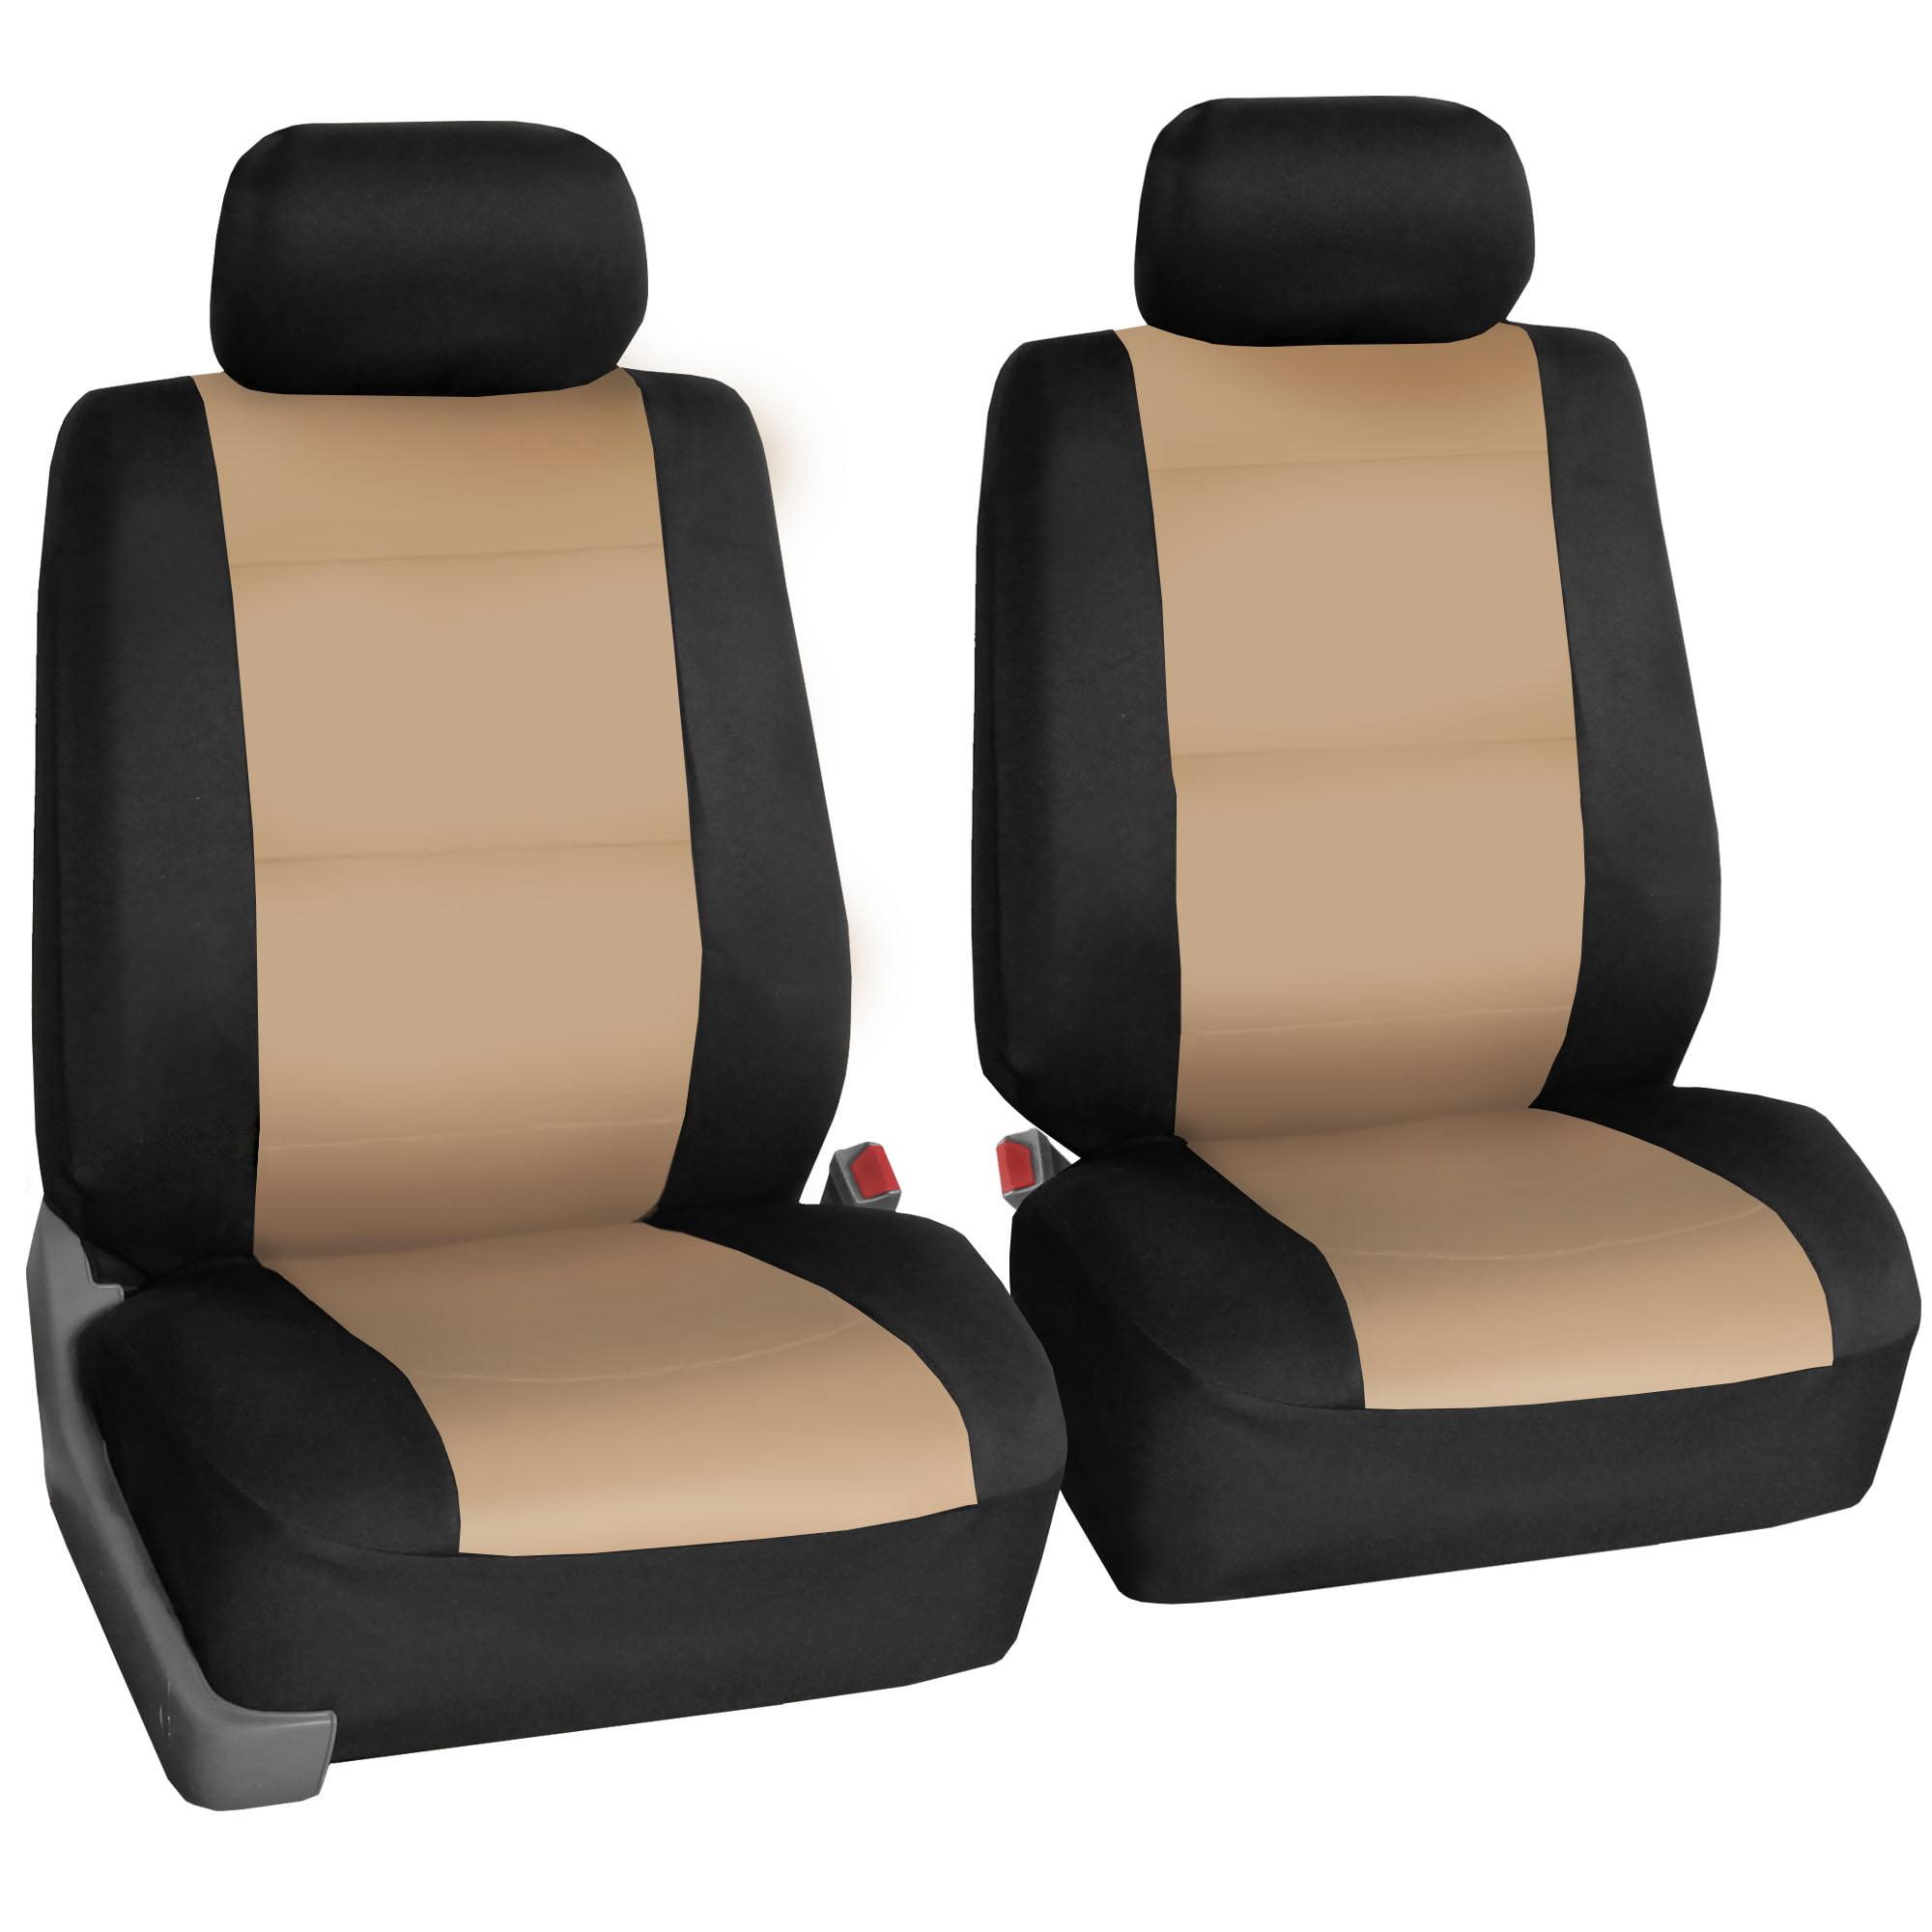 FH Group Neoprene Seat Covers for Sedan, SUV, Truck, Van, Two Front Buckets, Beige Black